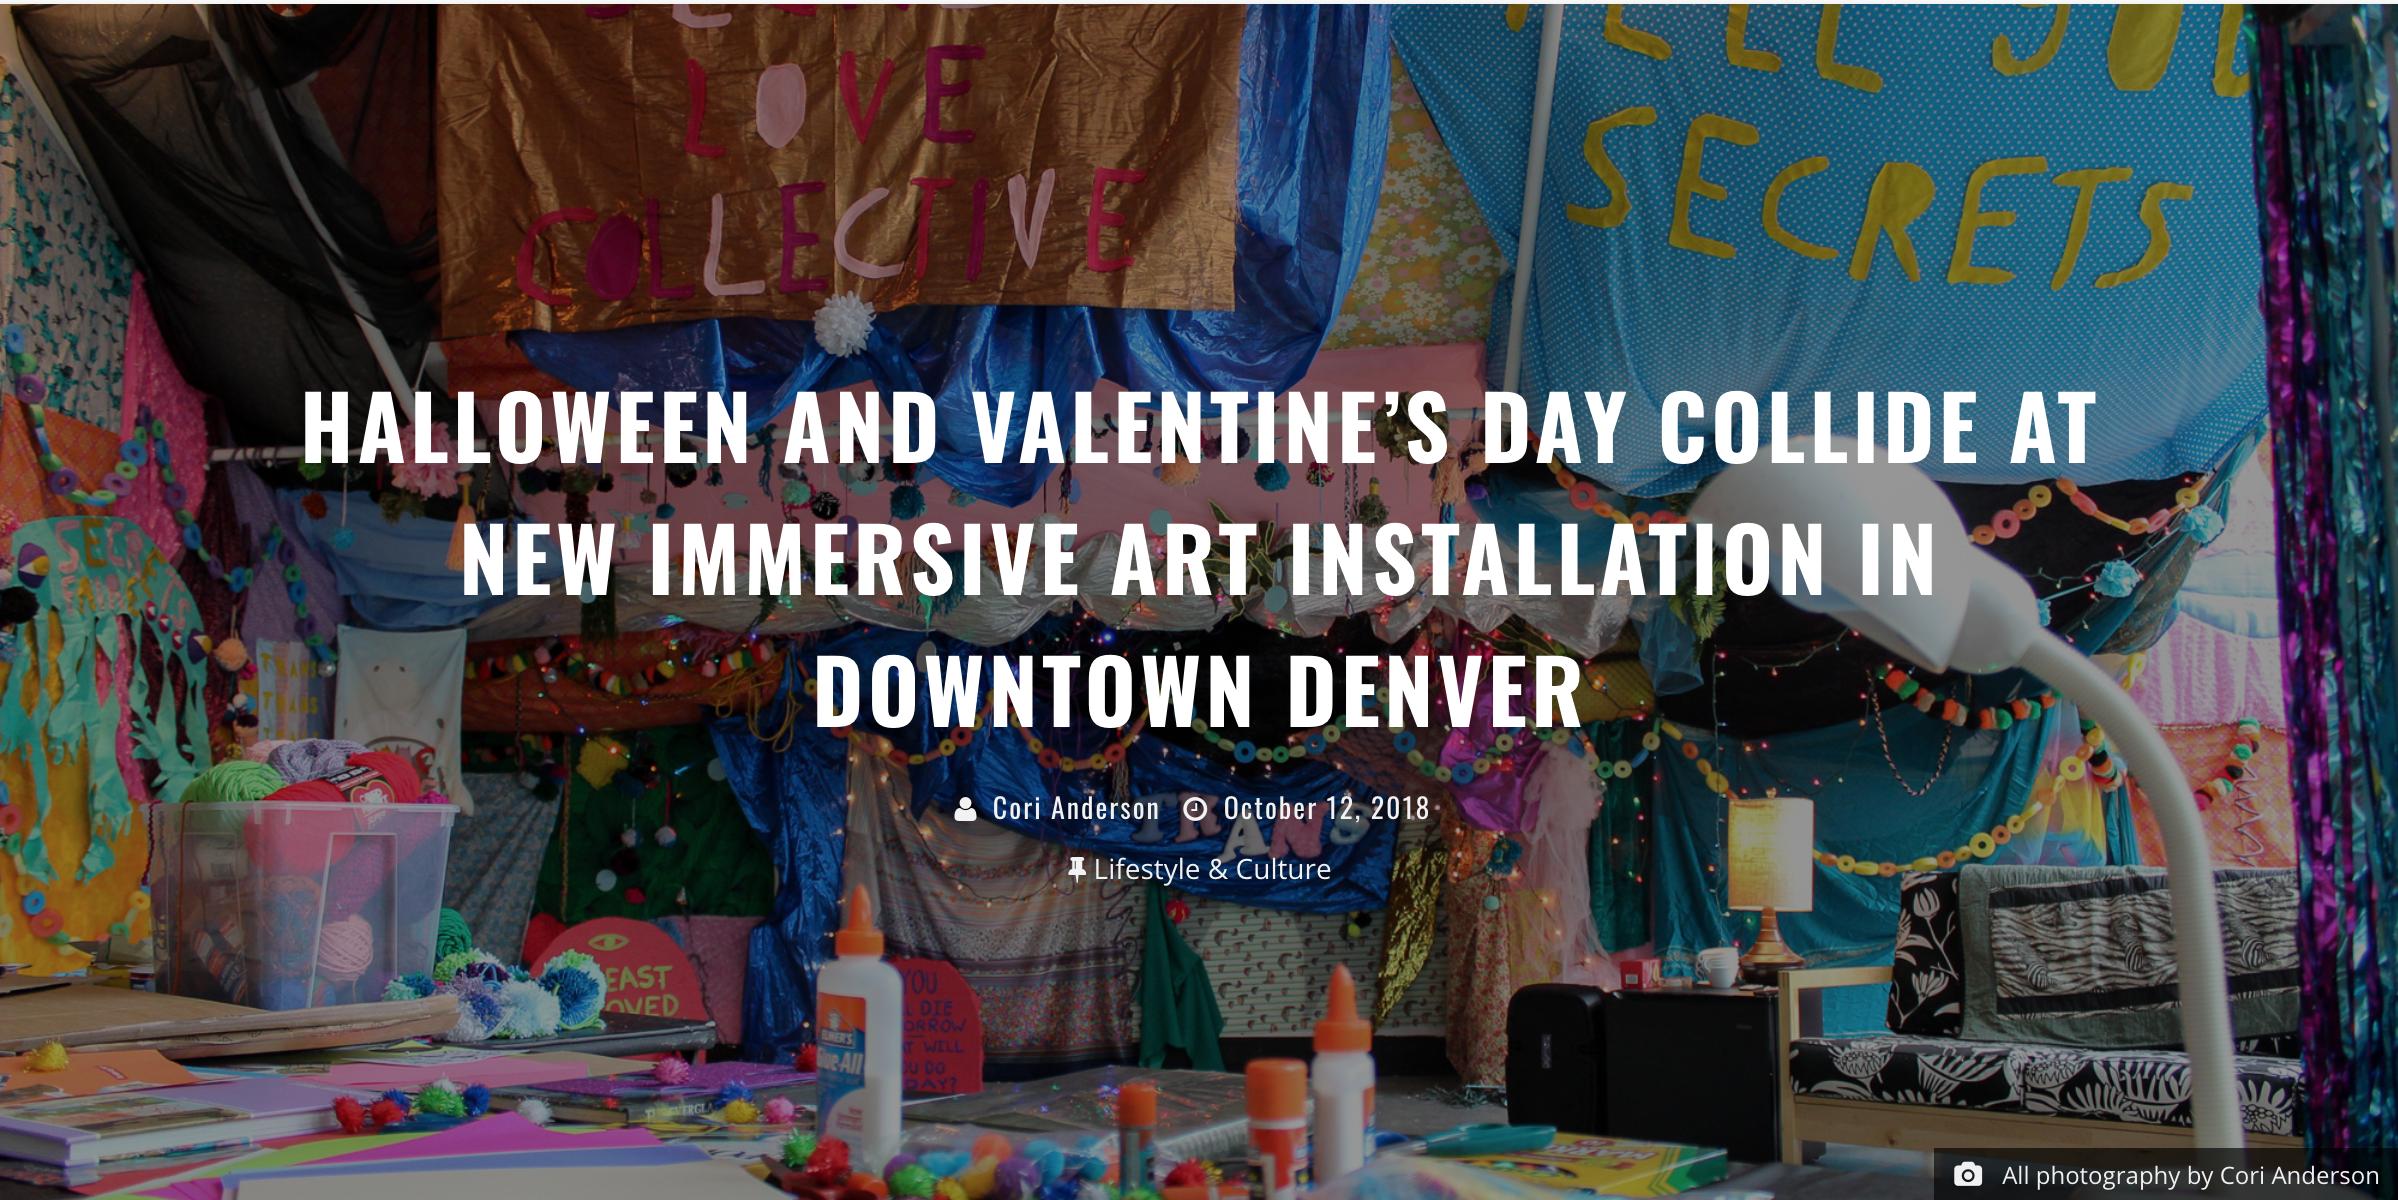 Halloween and Valentine's Day Collide at New Immersive Art Installation in Downtown Denver - https://303magazine.com/2018/10/secret-love-collective-understudy-denver/